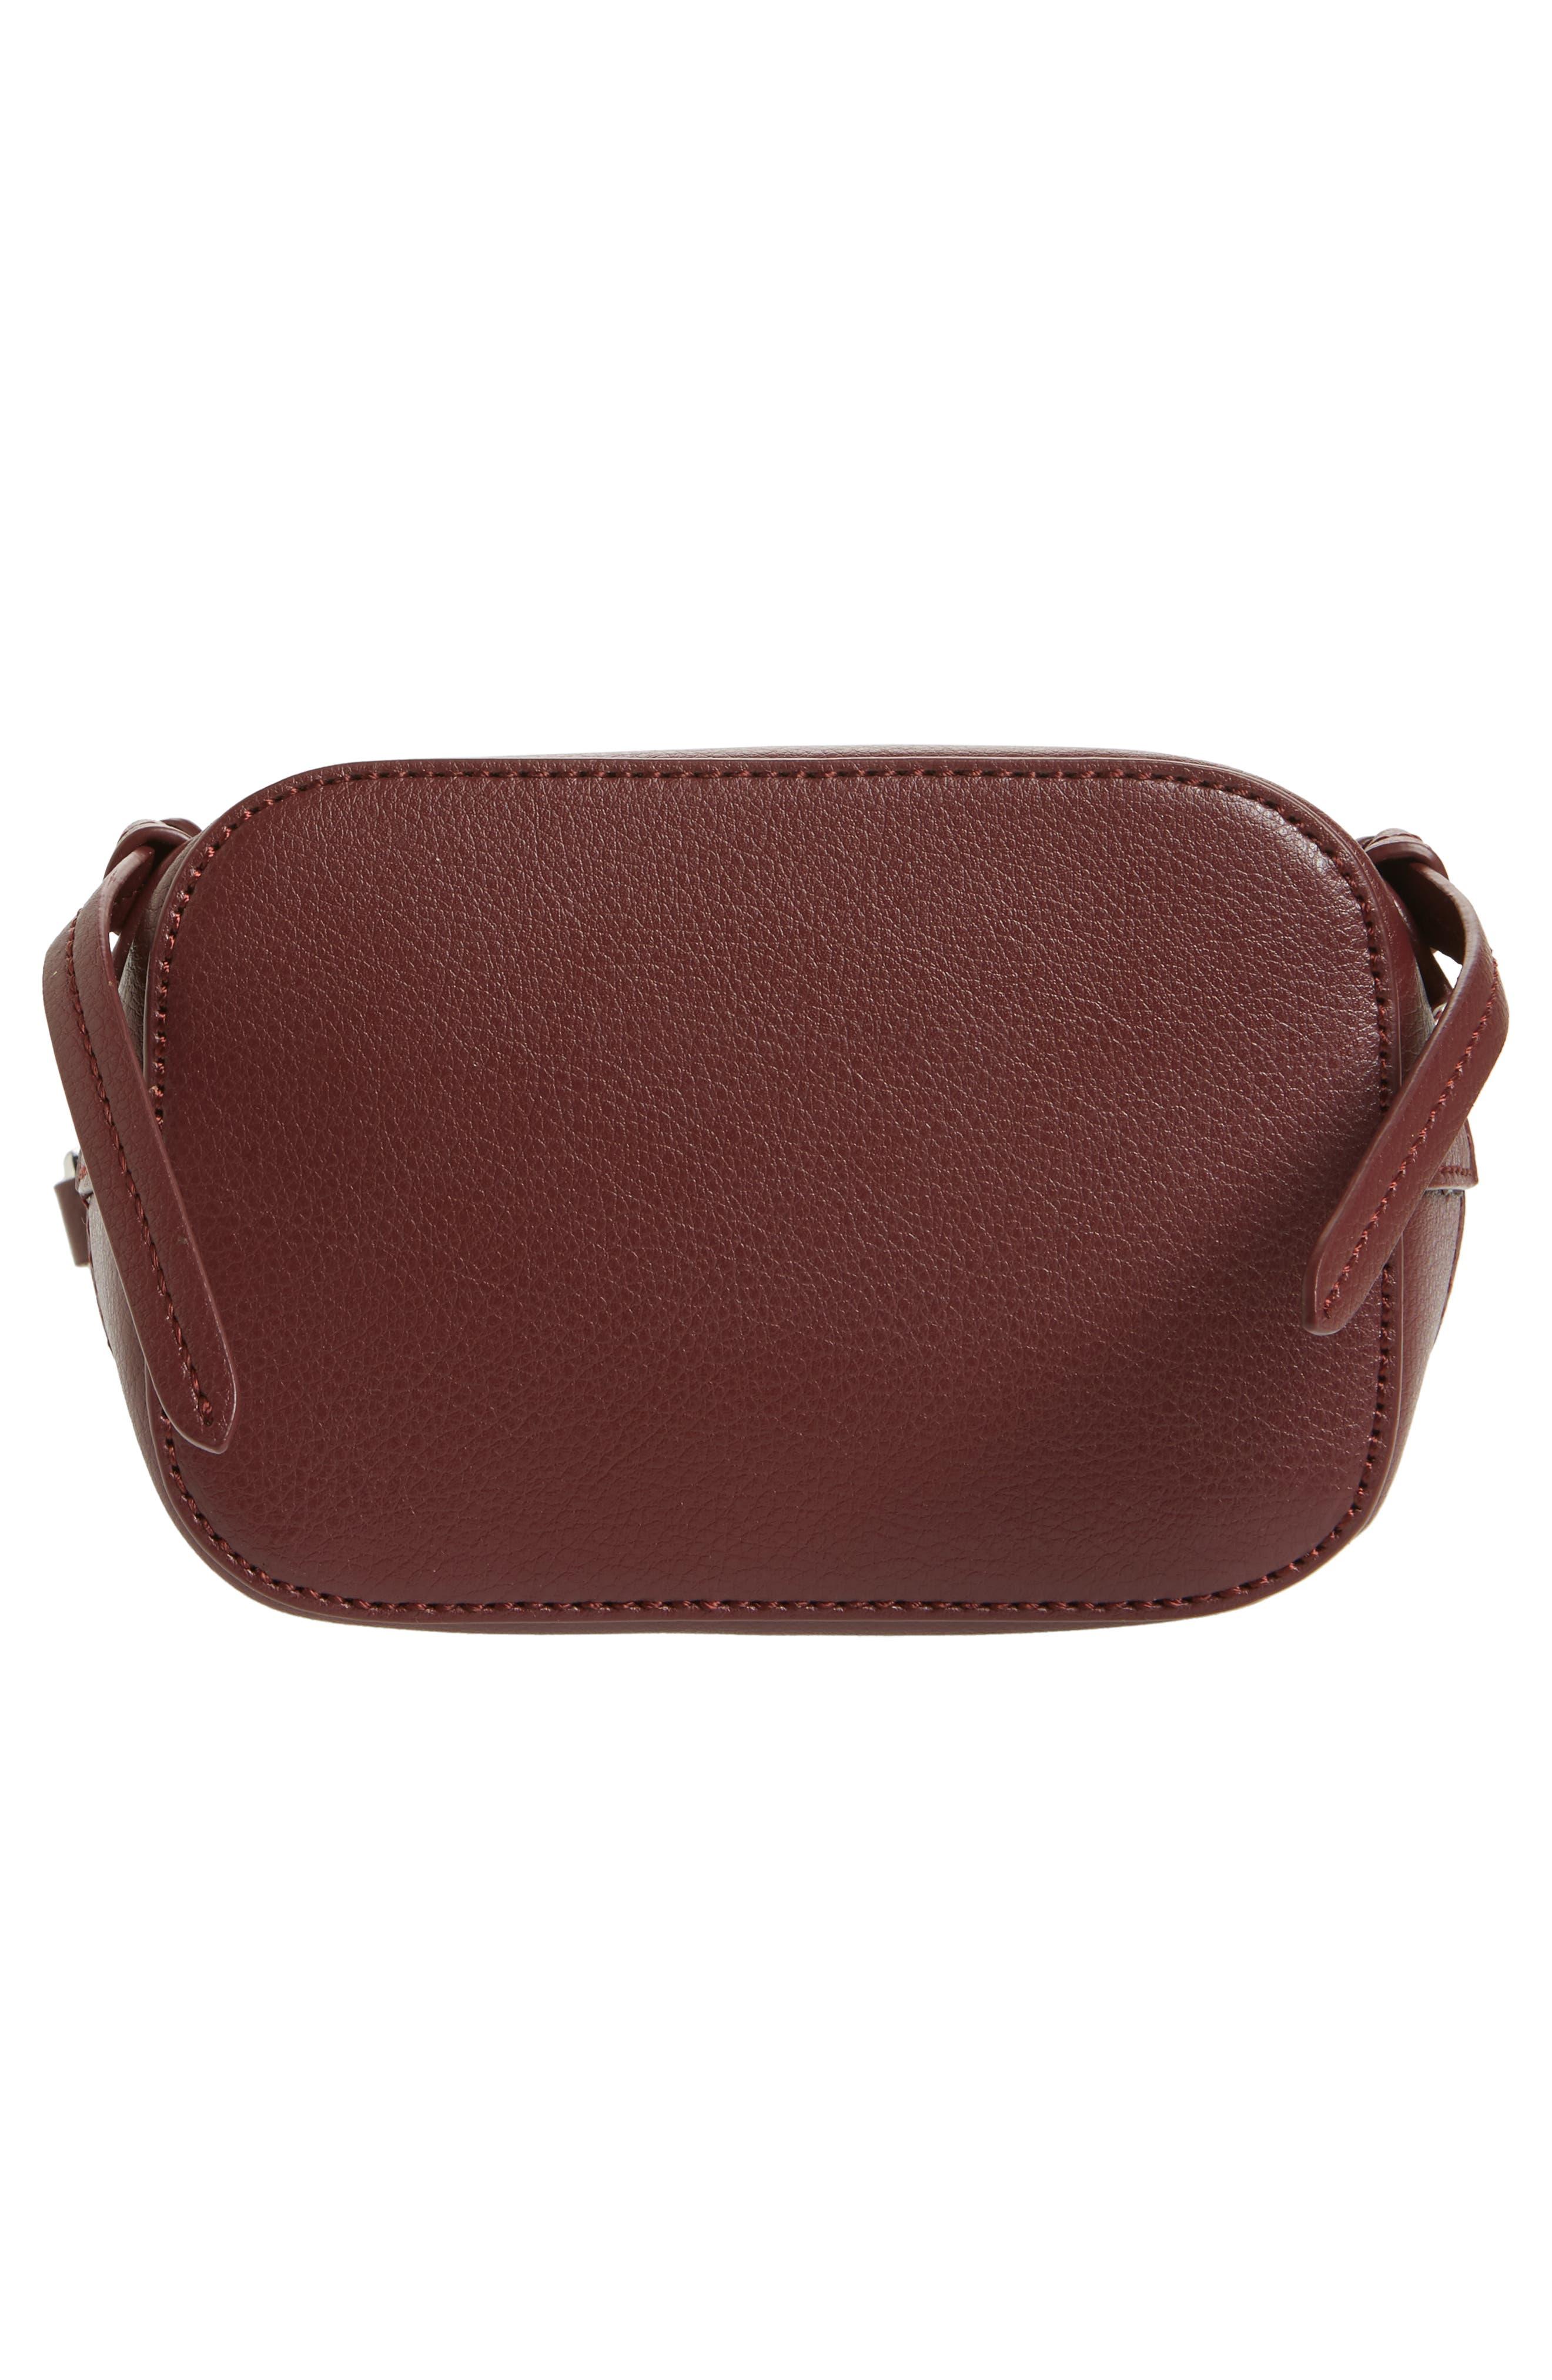 Beckett Leather Crossbody Bag,                             Alternate thumbnail 6, color,                             Wine